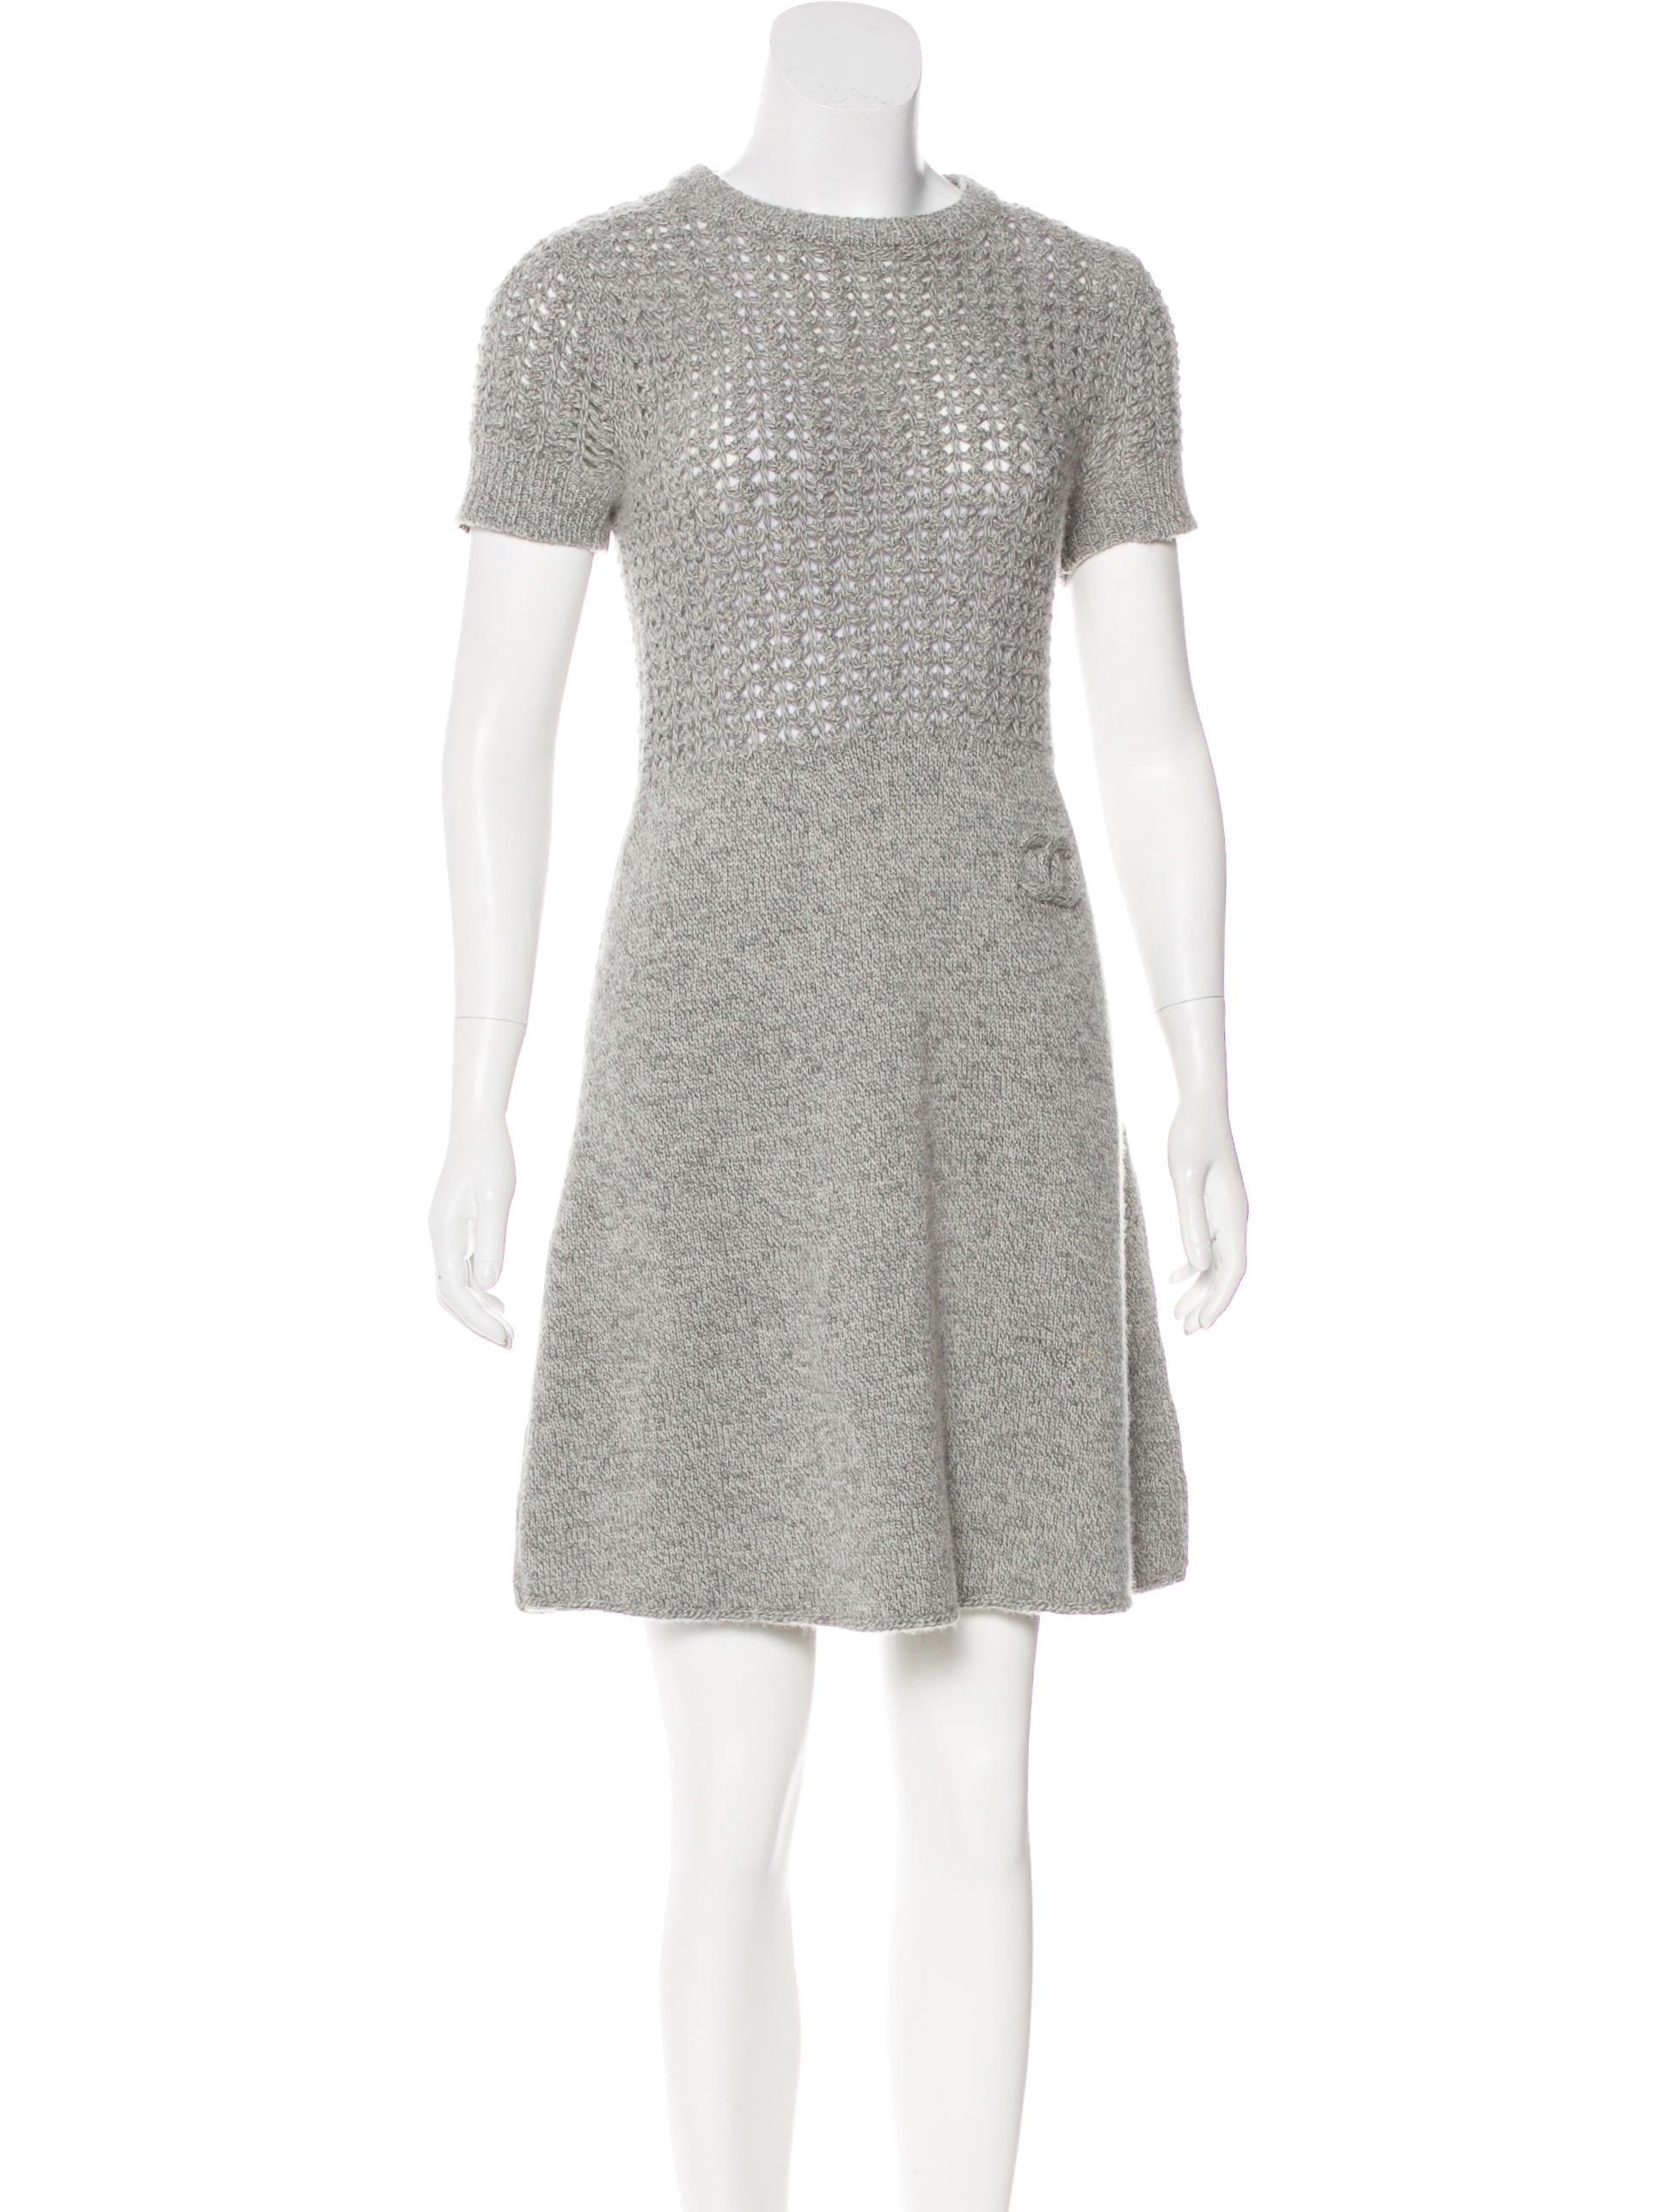 Chanel Sport Wool Dress - Clothing - CHA223806